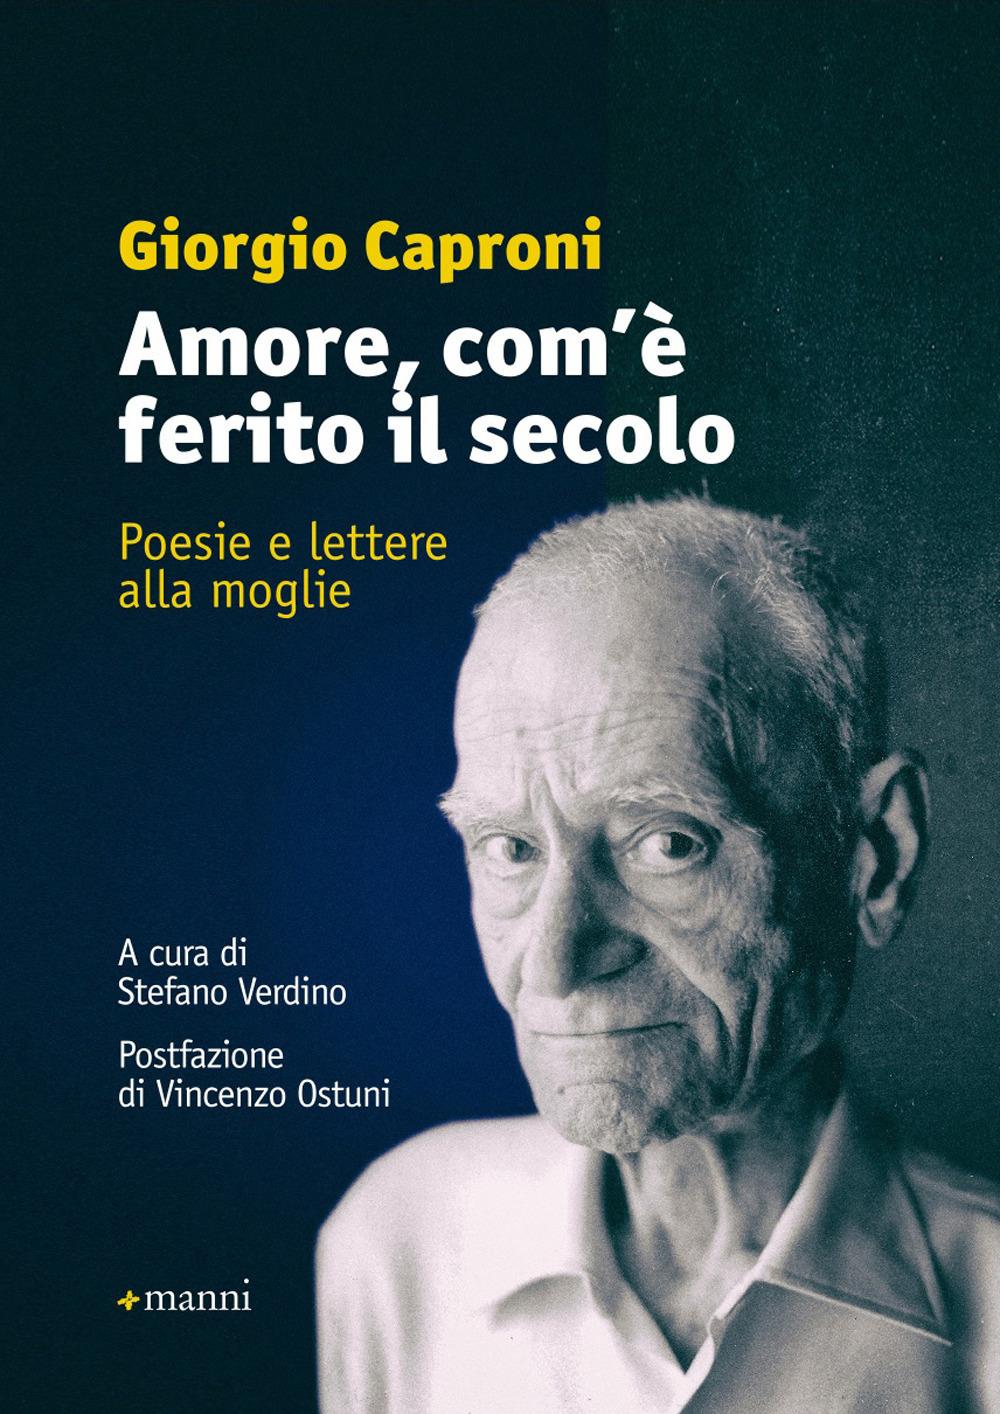 Stefano Verdino